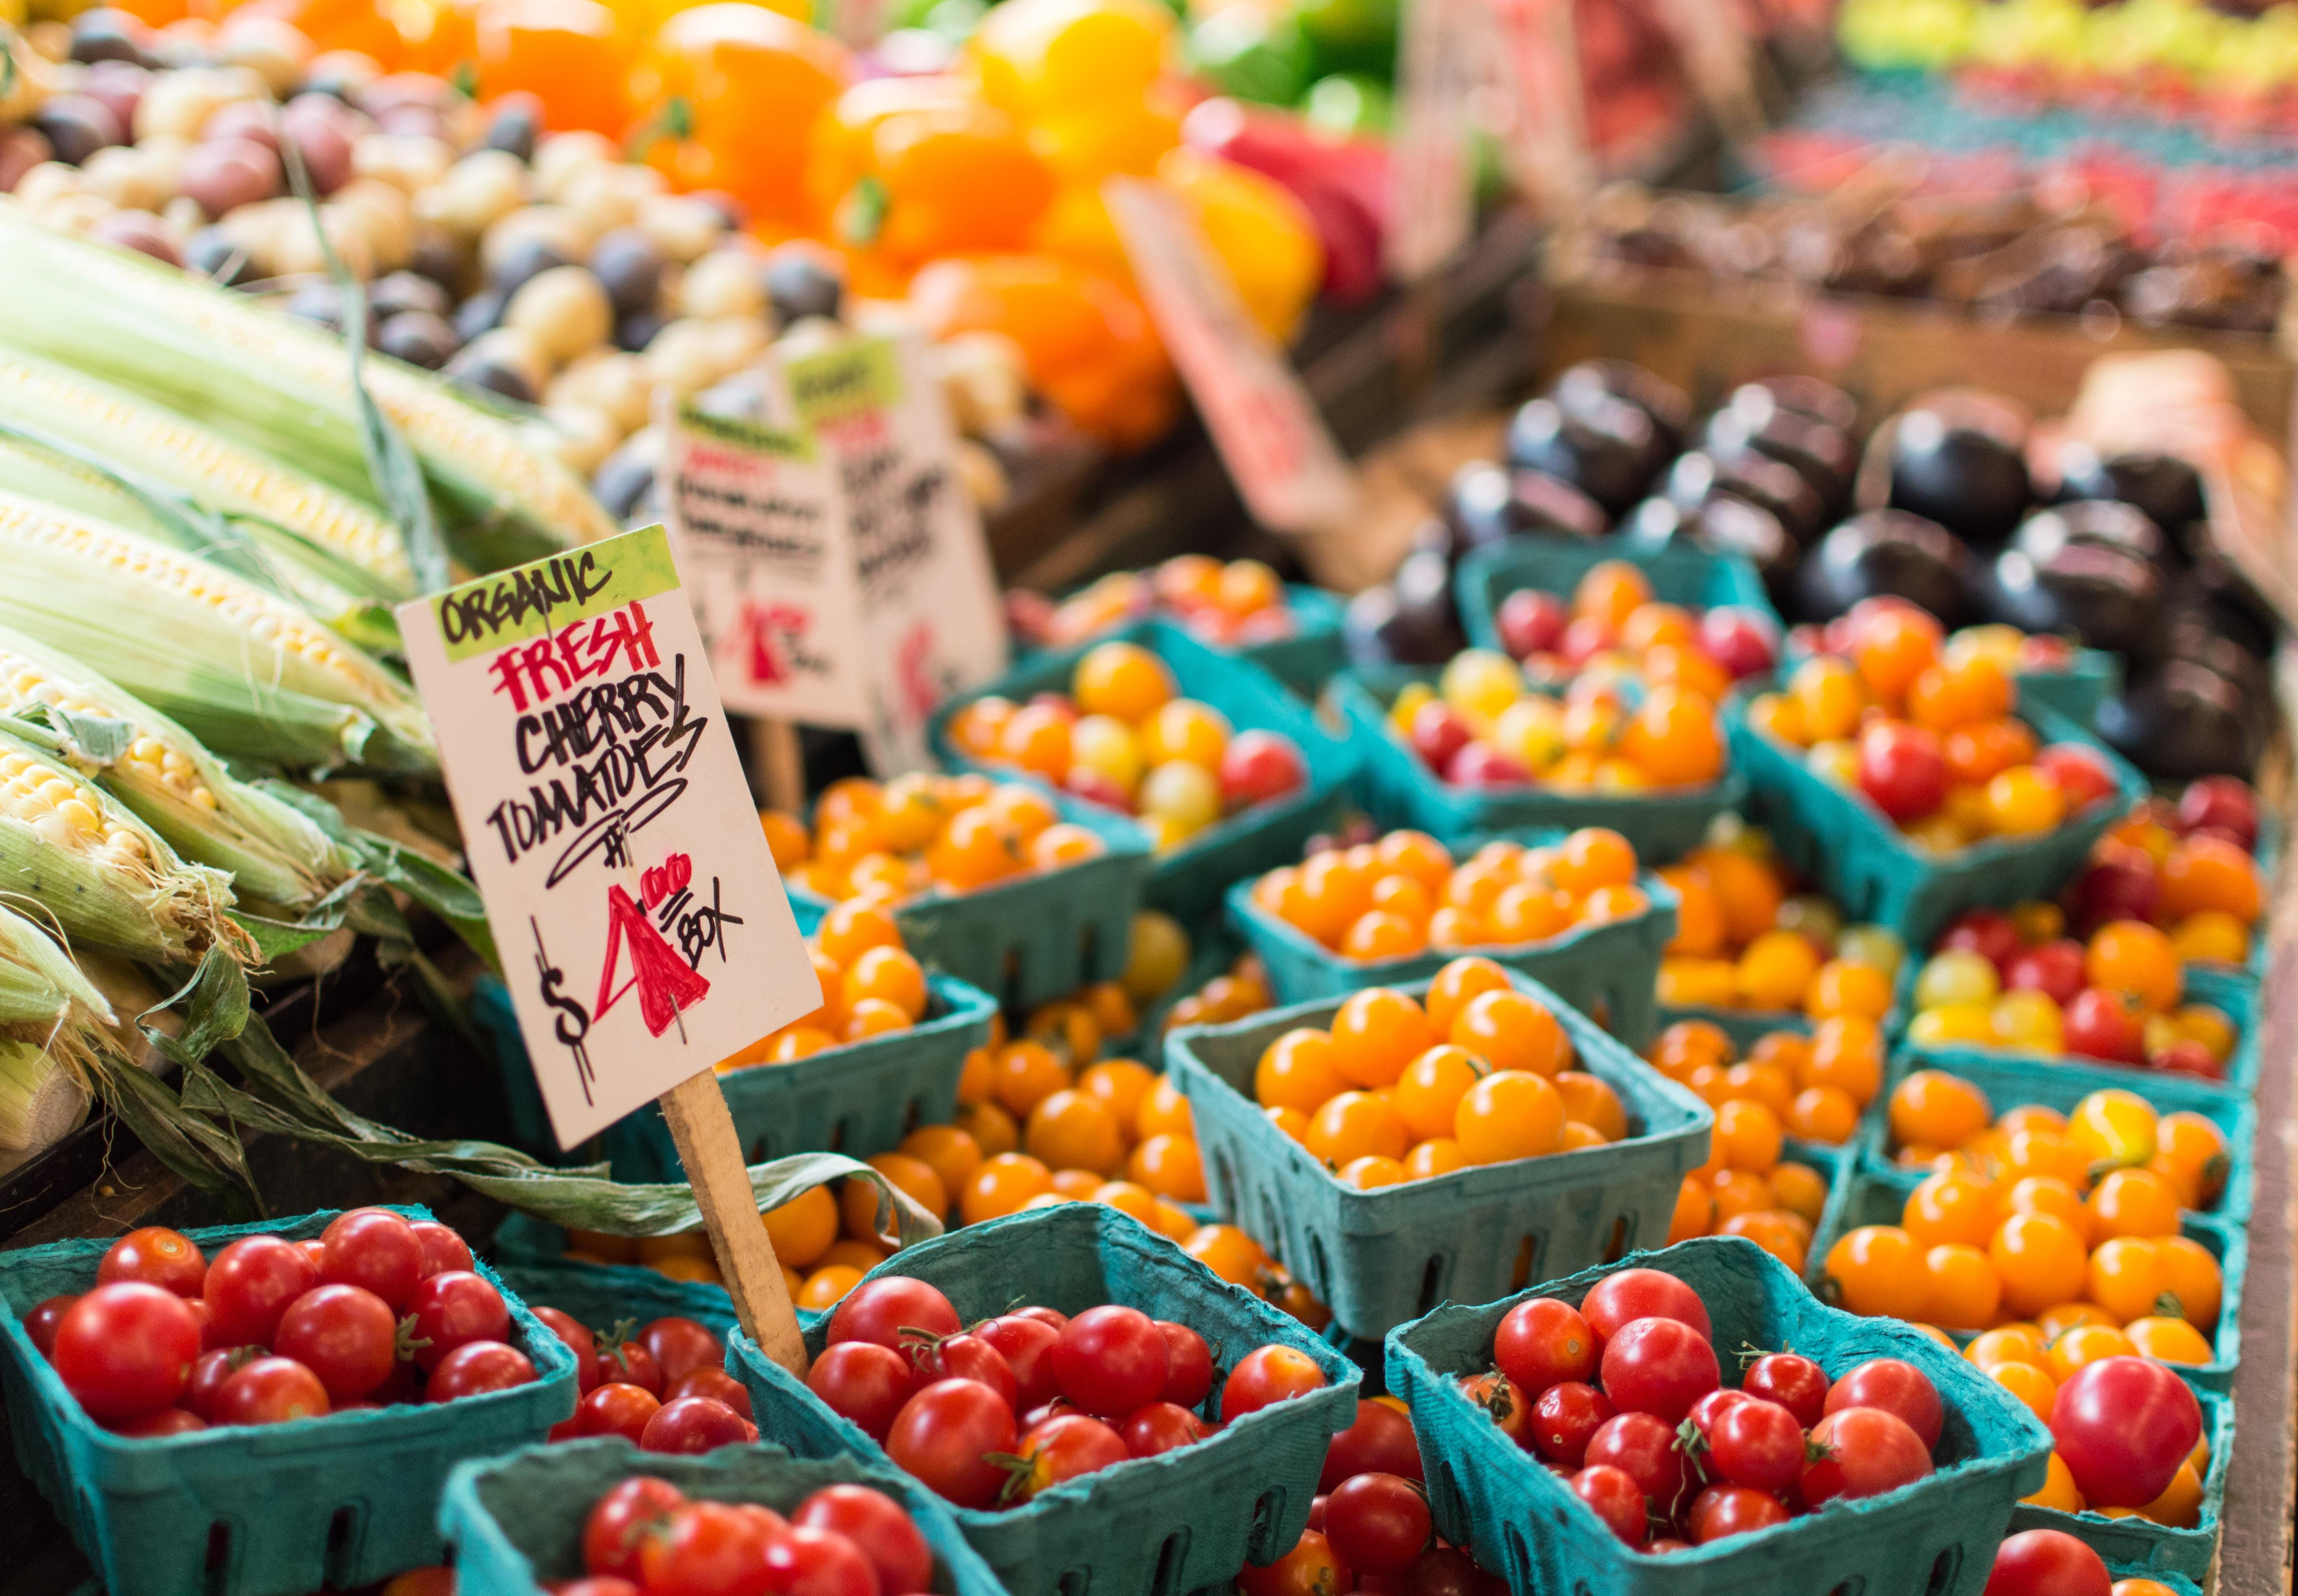 anne-preble-Tomatos-unsplash